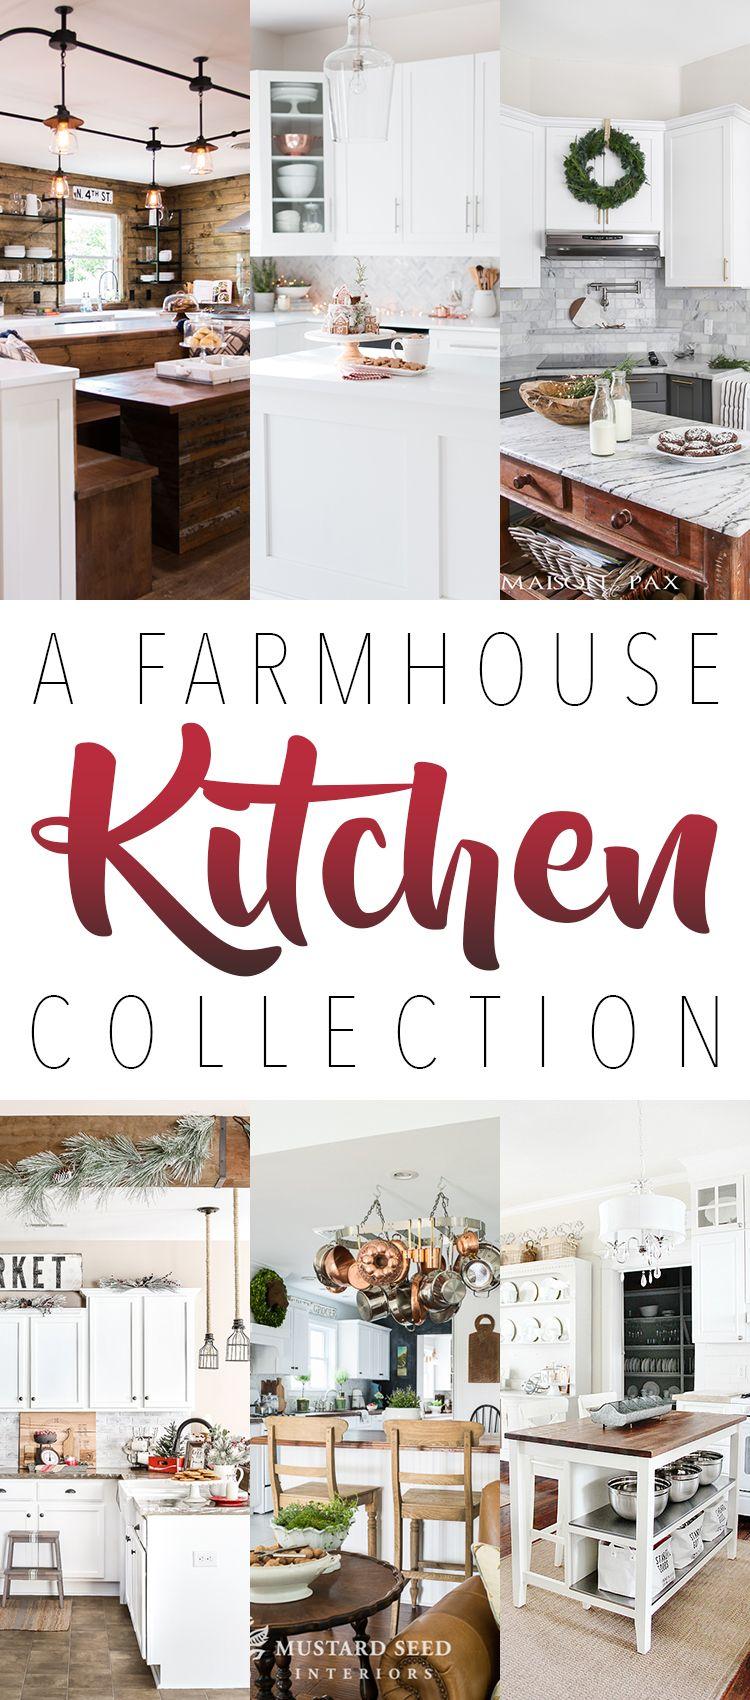 A Farmhouse Kitchen Collection #kitchencollection